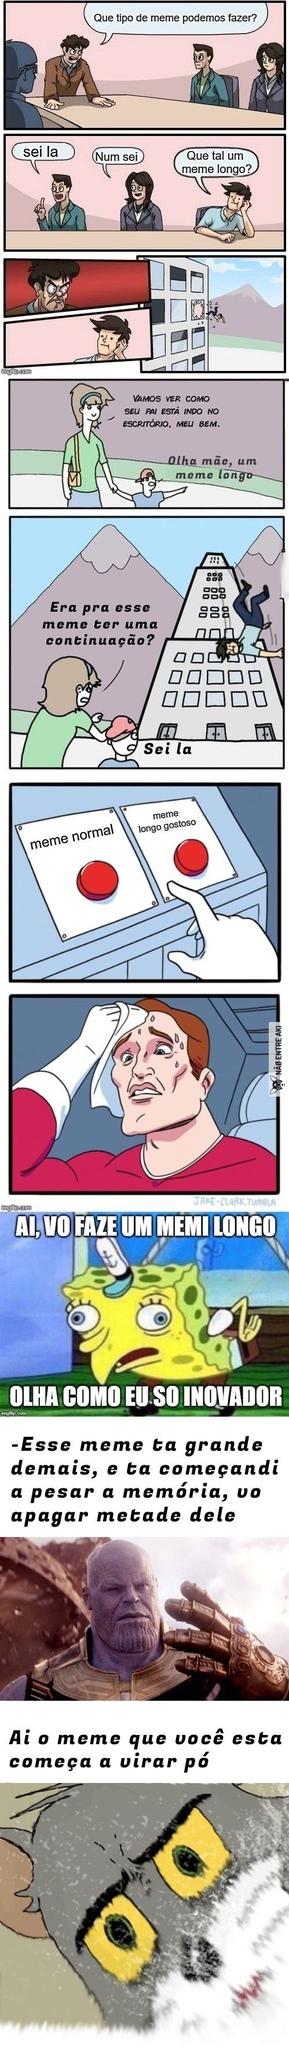 Inserir tag - meme